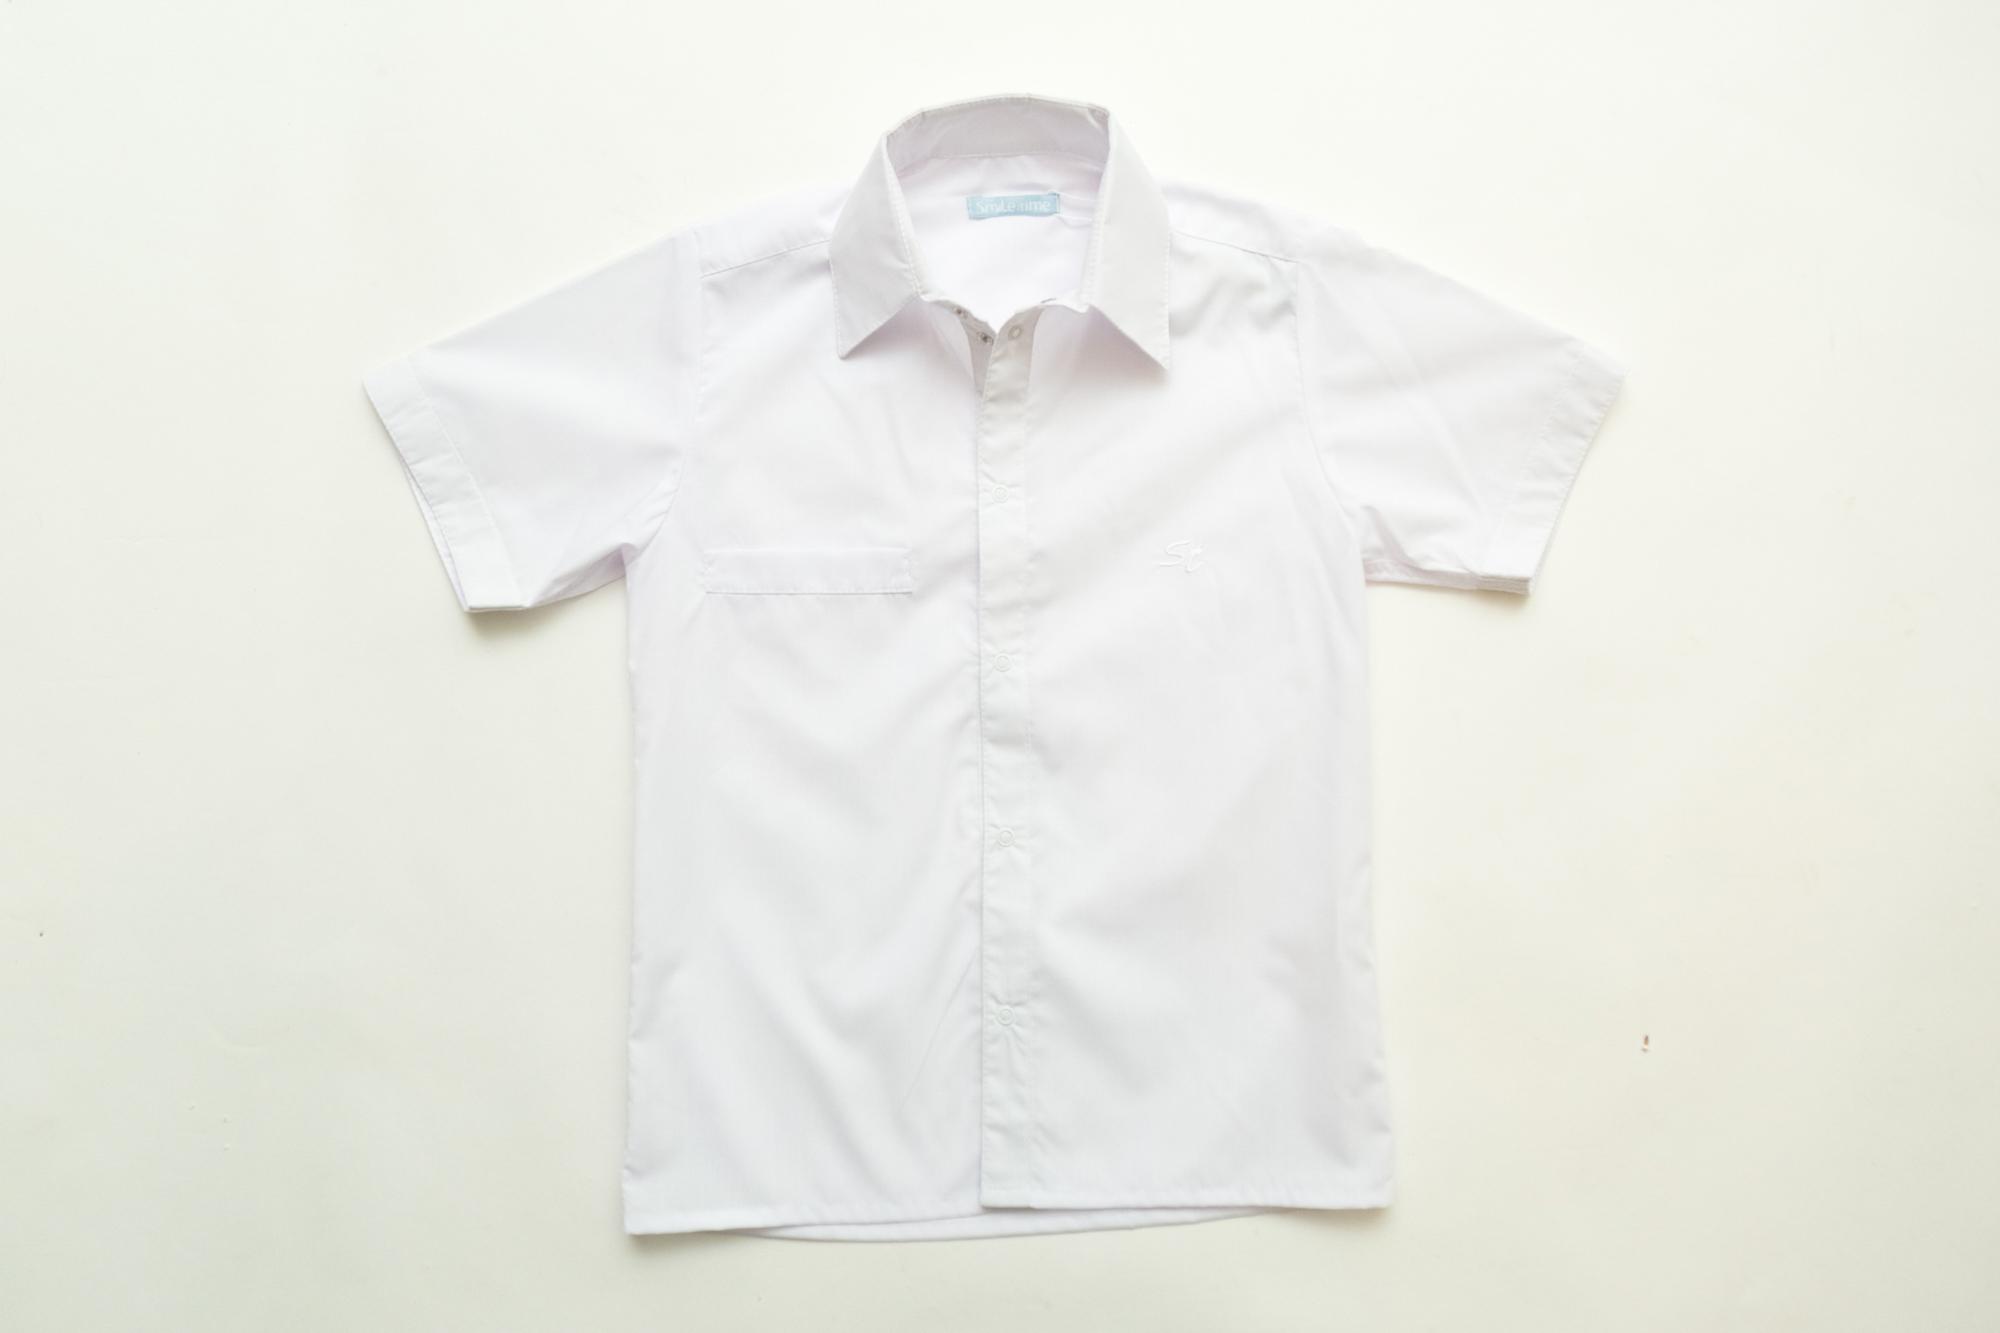 Рубашка SmileTime для мальчика с коротким рукавом на кнопках, белая